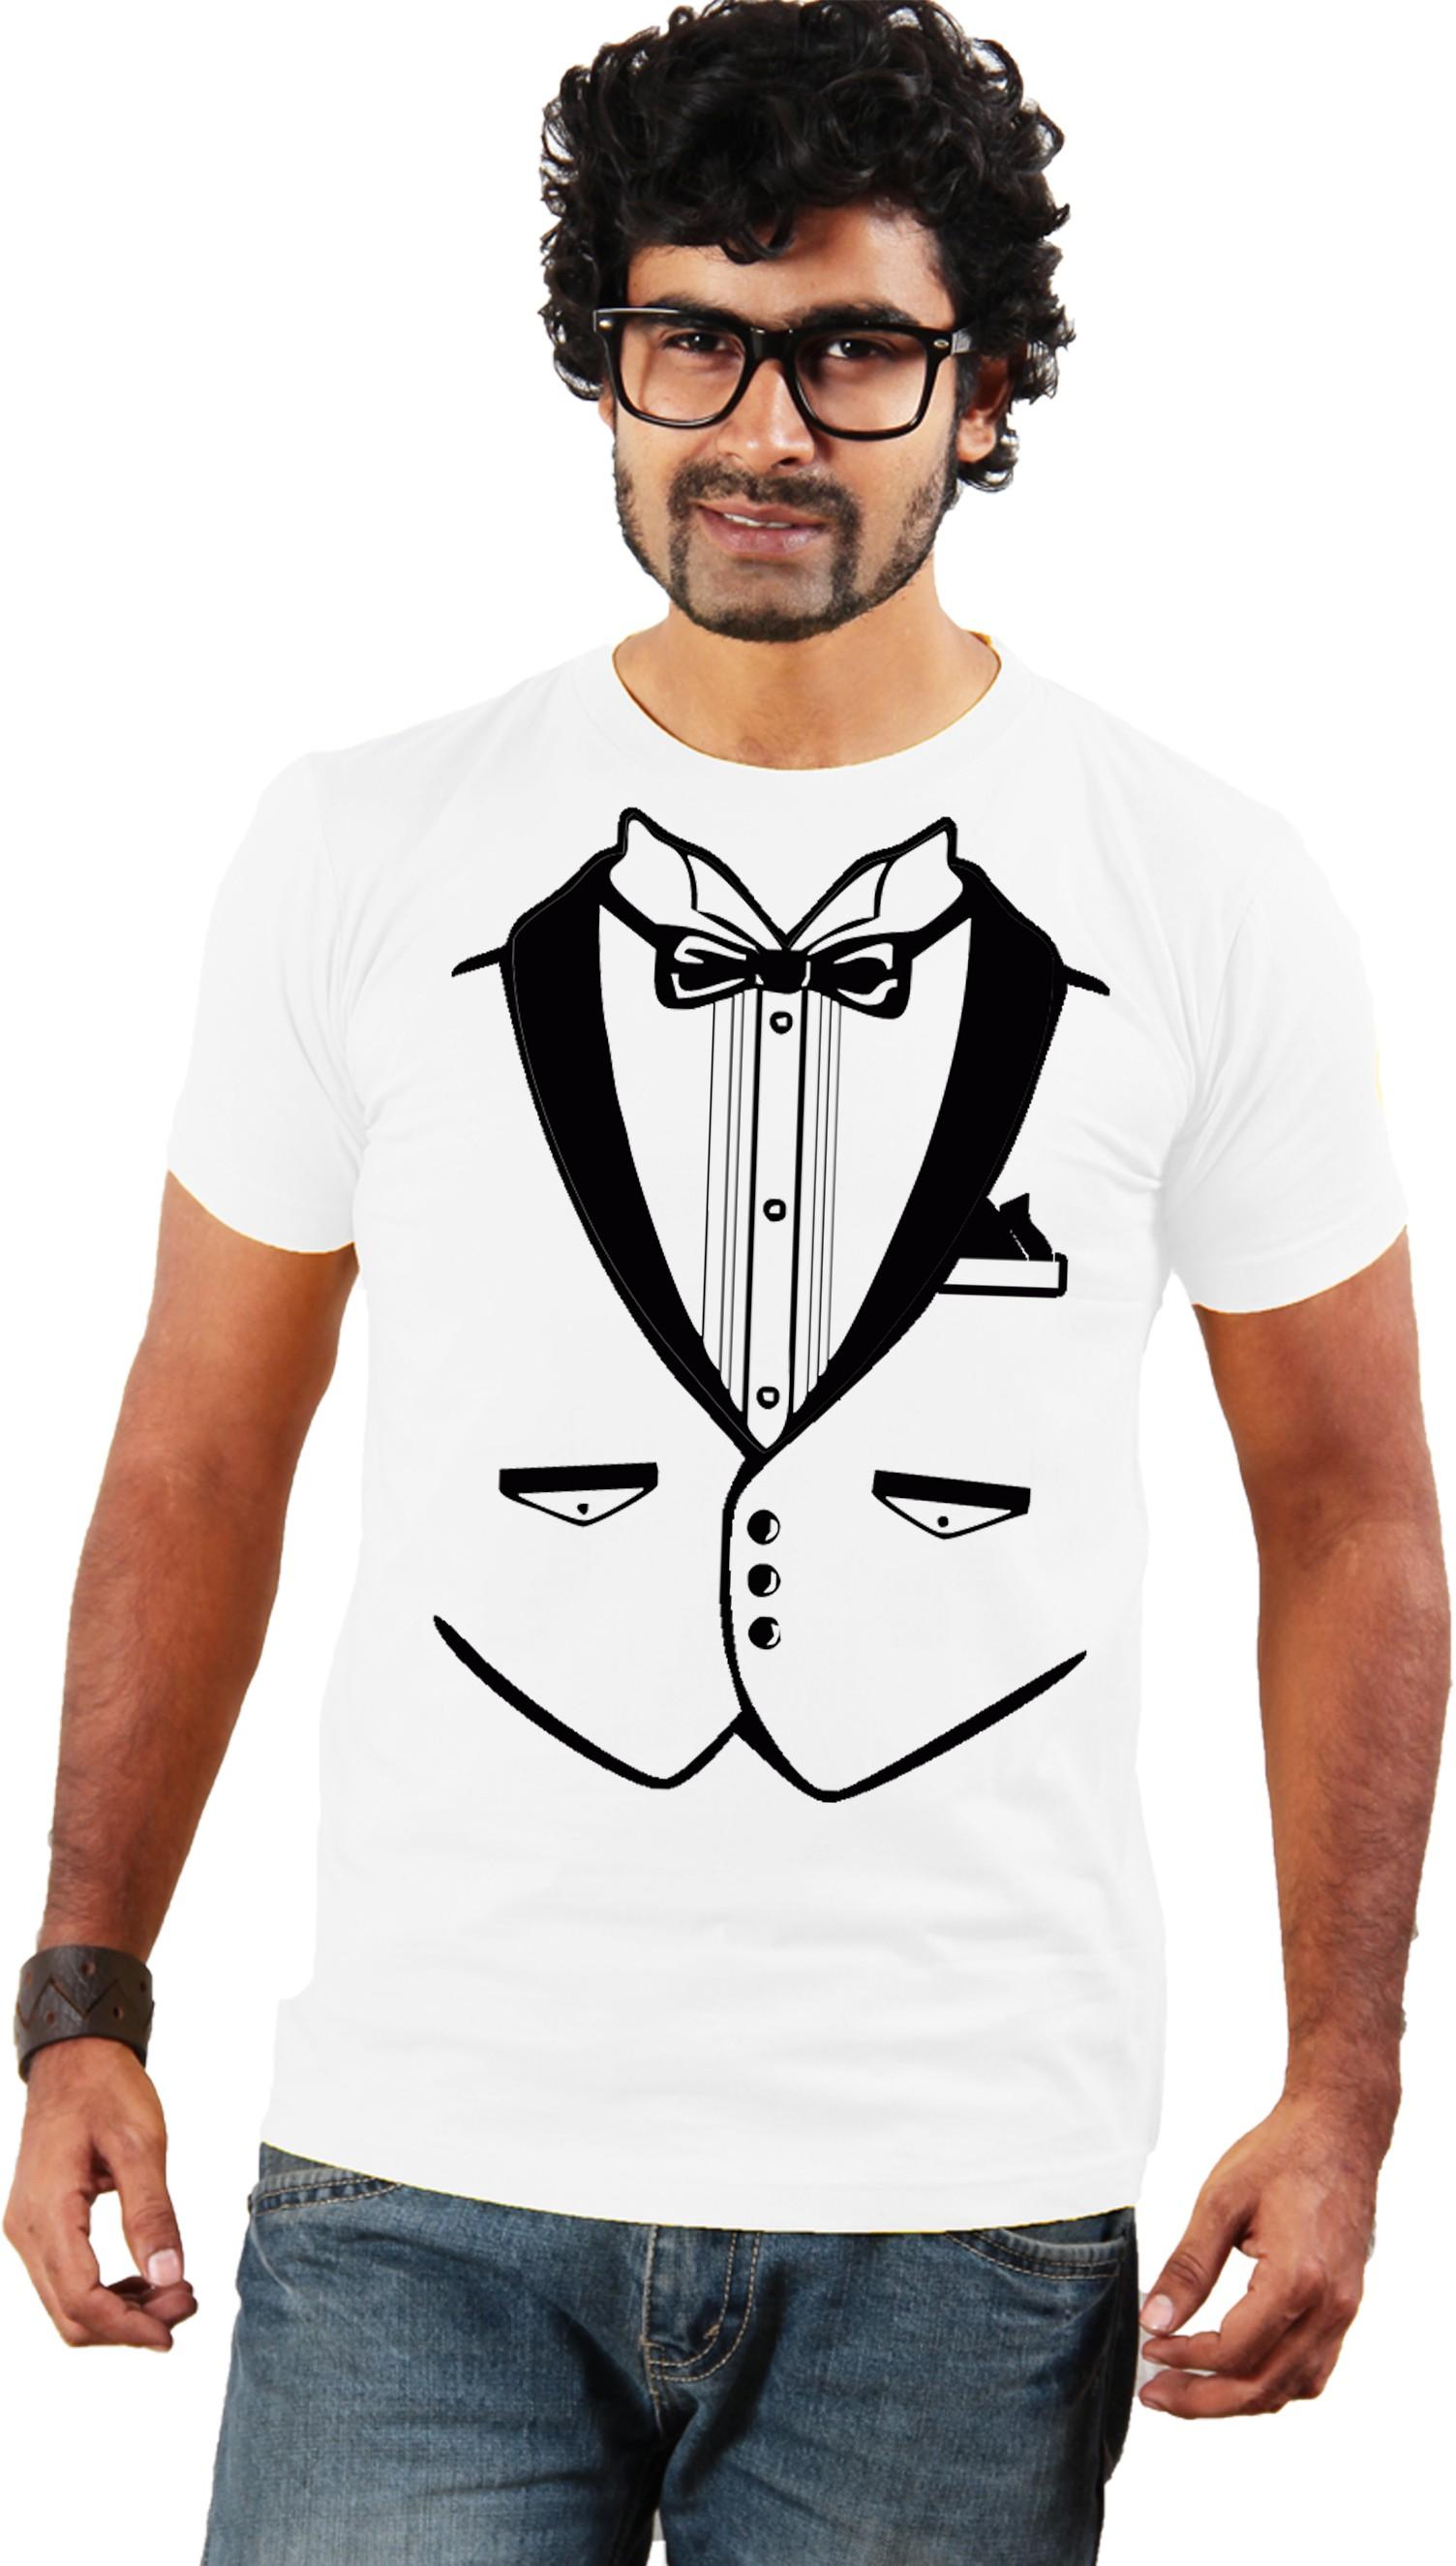 Shopping Monster Graphic Print Men's Round Neck T-Shirt